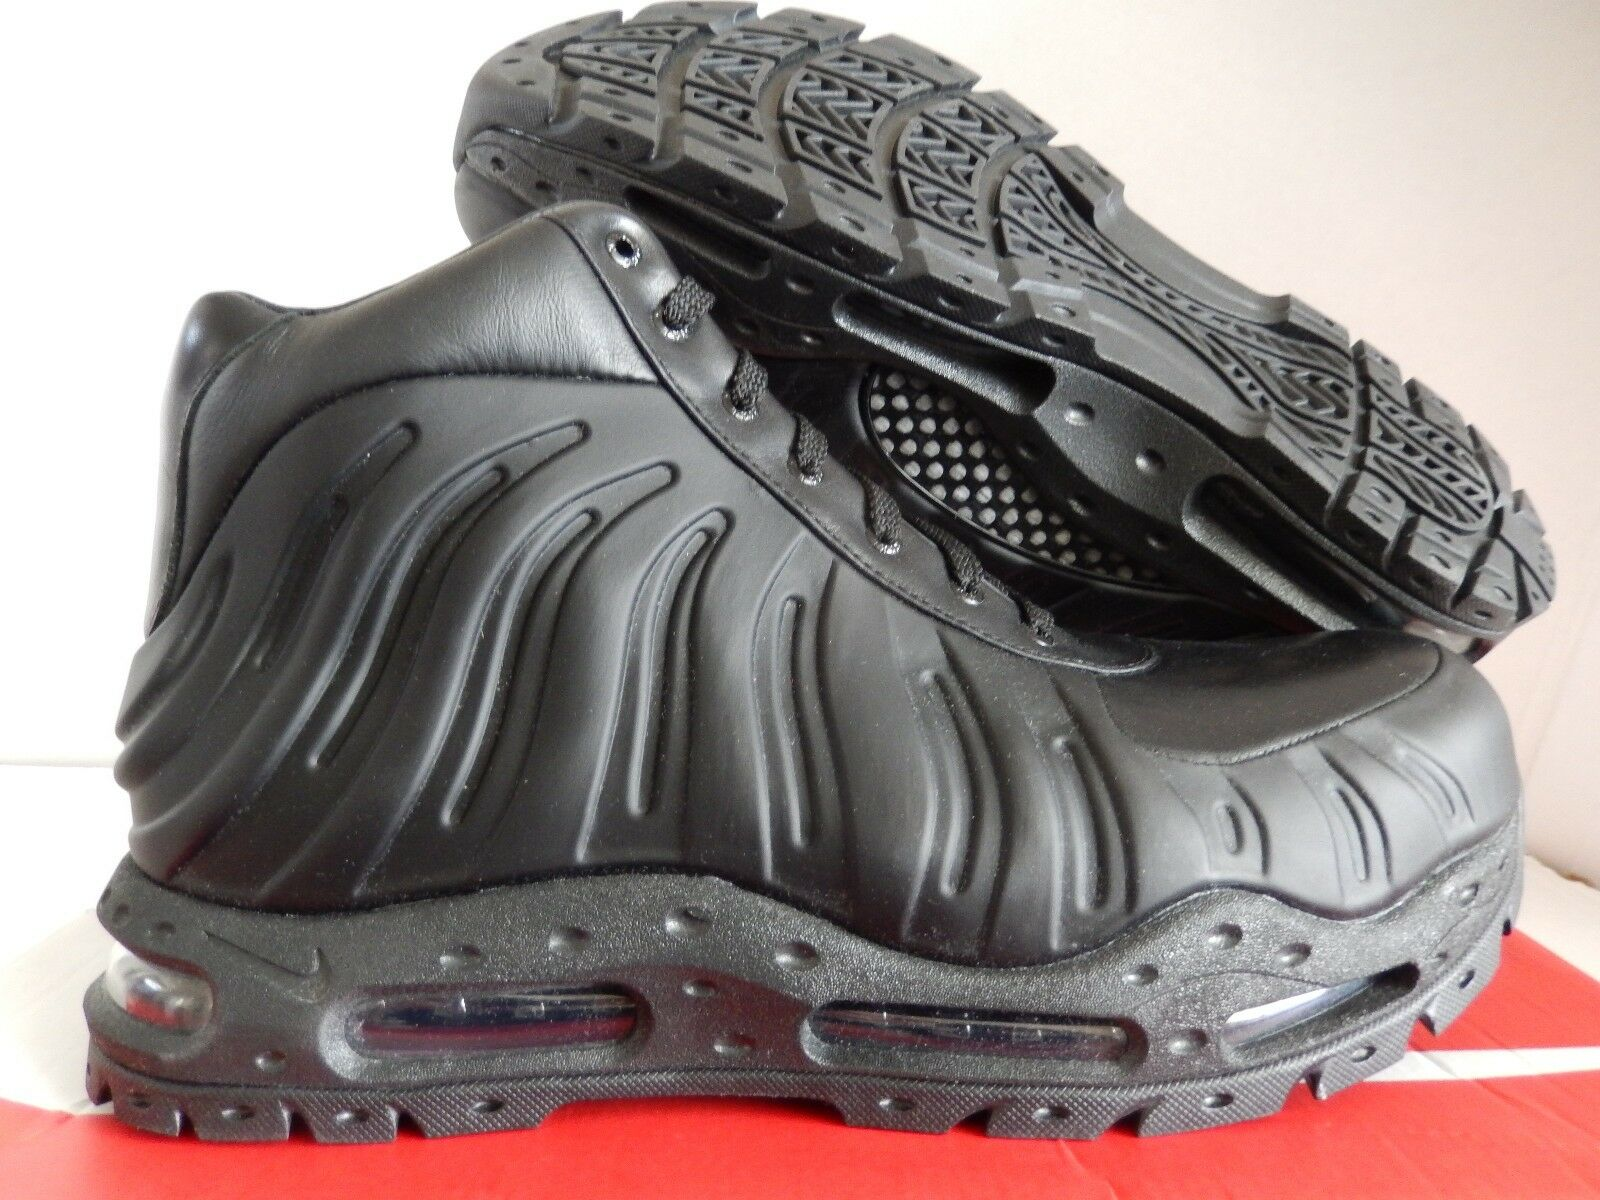 NIKE AIR MAX FOAMDOME FOAMPOSITE BOOTS BLACK-BLACK SZ 7.5 [843749-002]